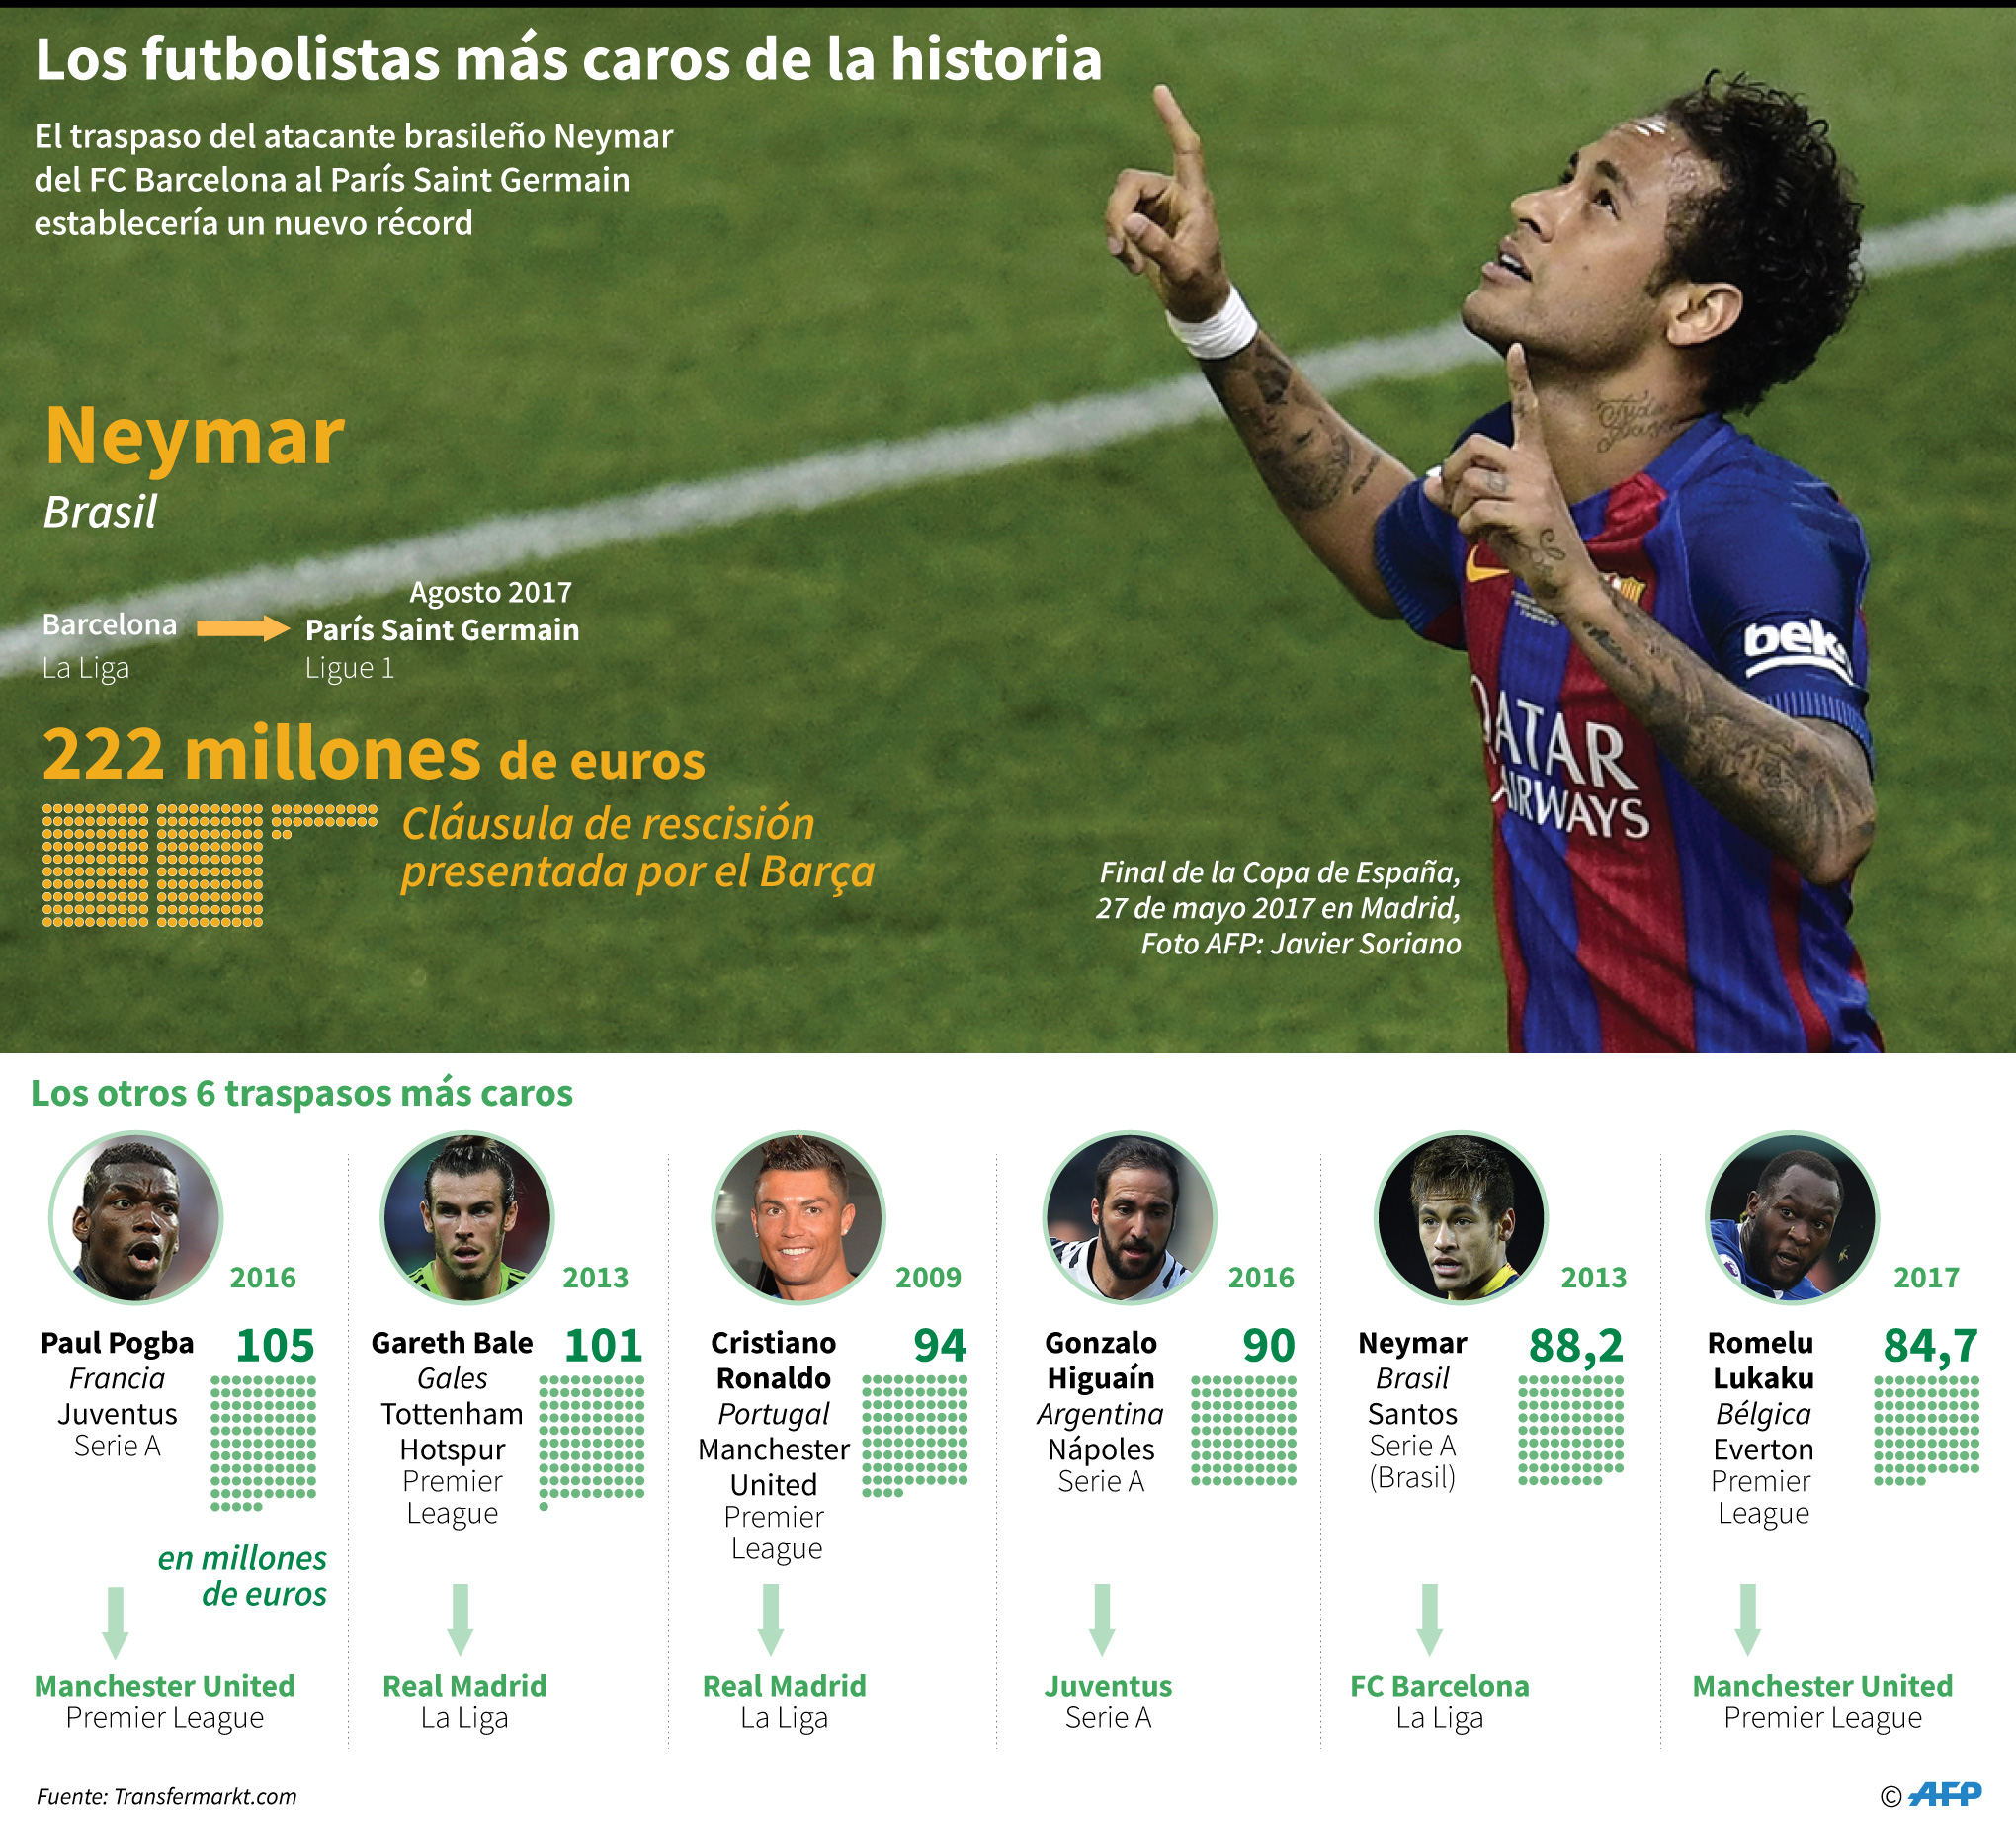 Neymar qued libre de ir al psg ent rate por qu for Clausula suelo oficina directa